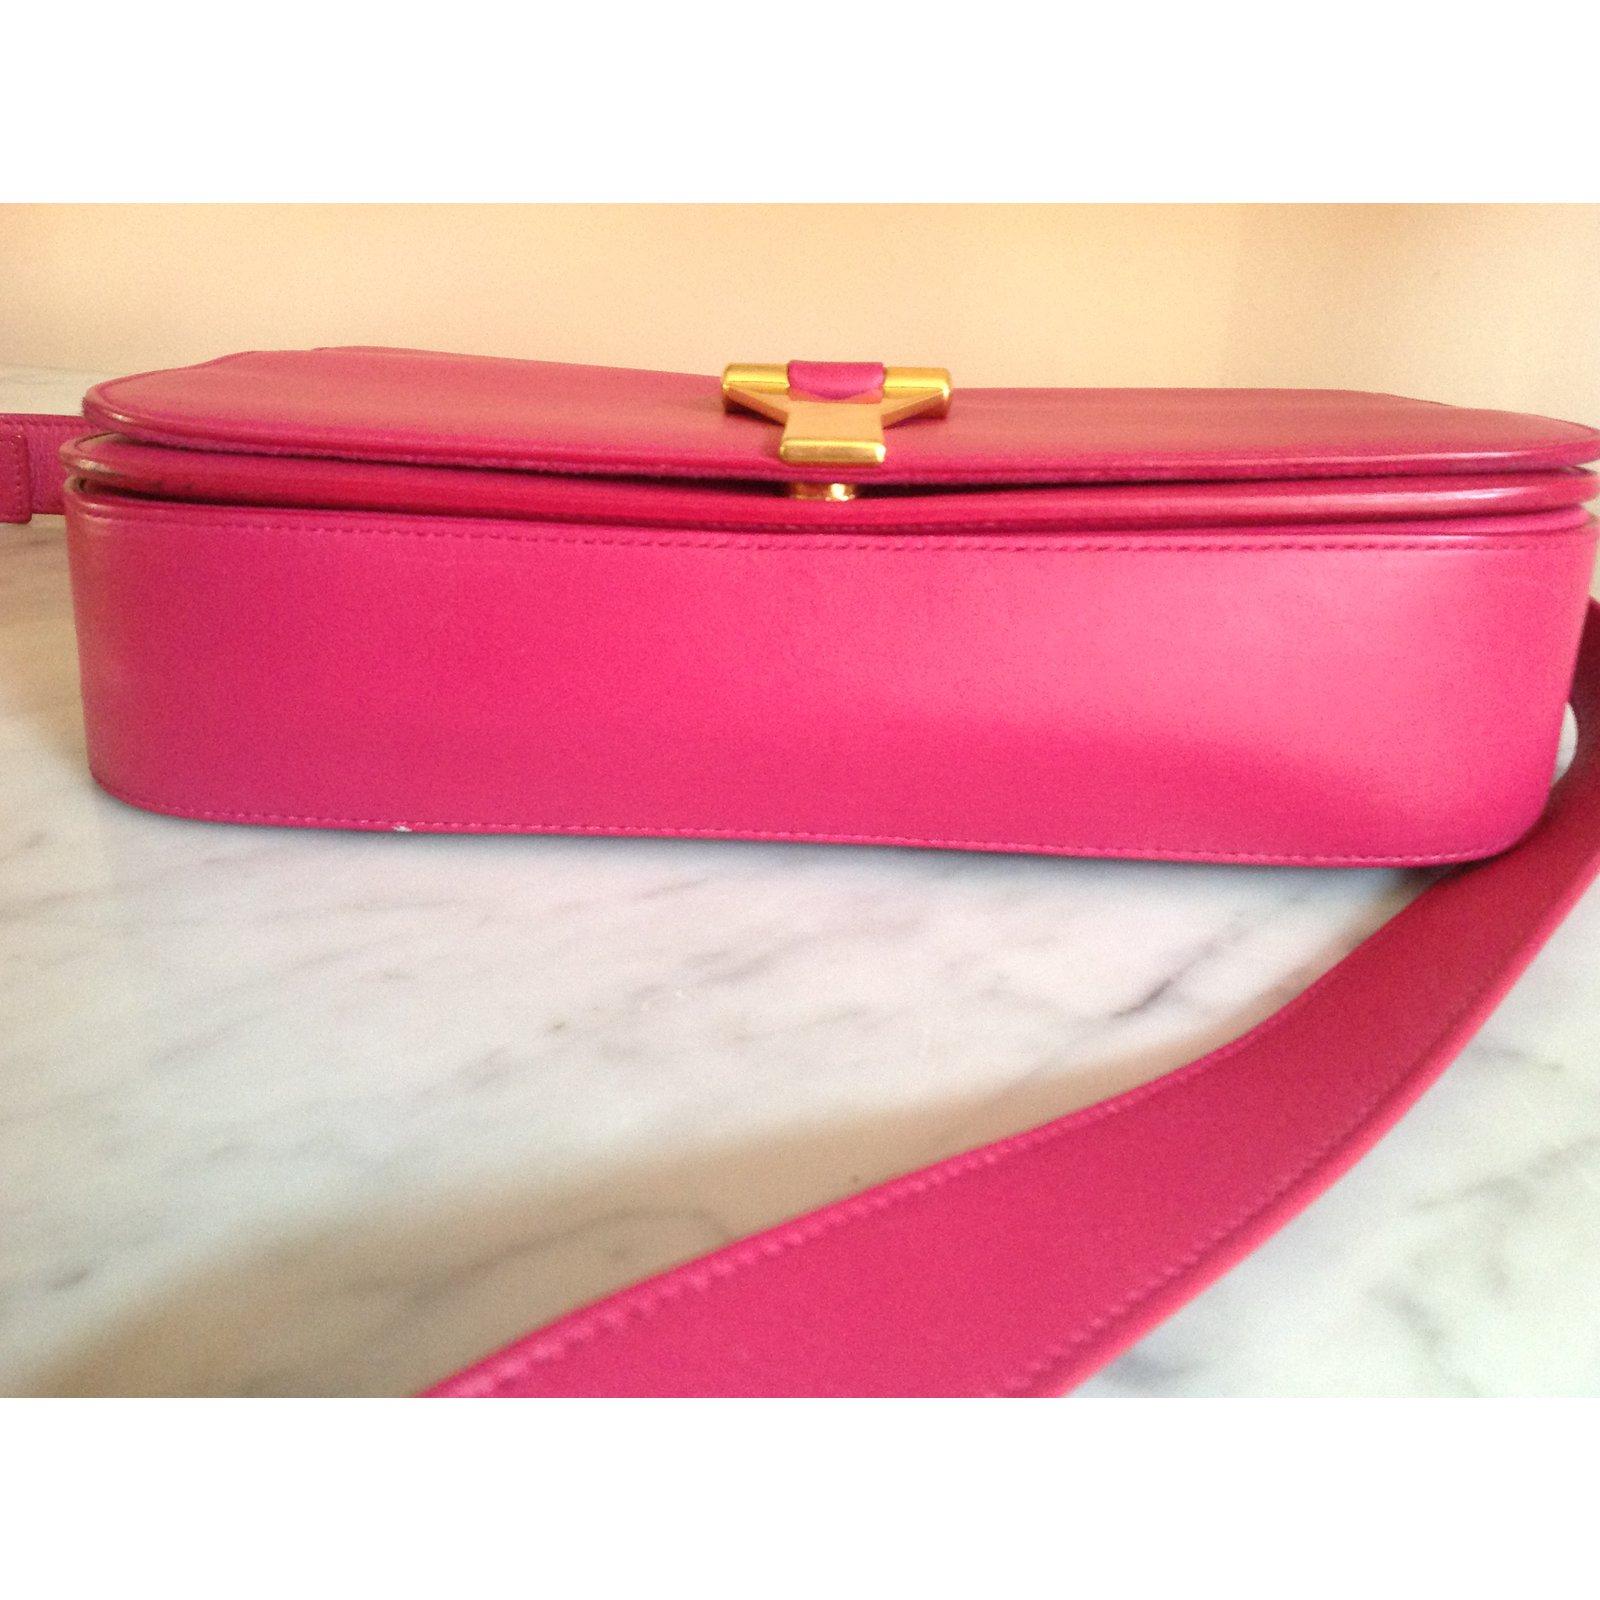 b69f32dc55 Facebook · Pin This. Yves Saint Laurent Bag Handbags Leather Pink ref.75778